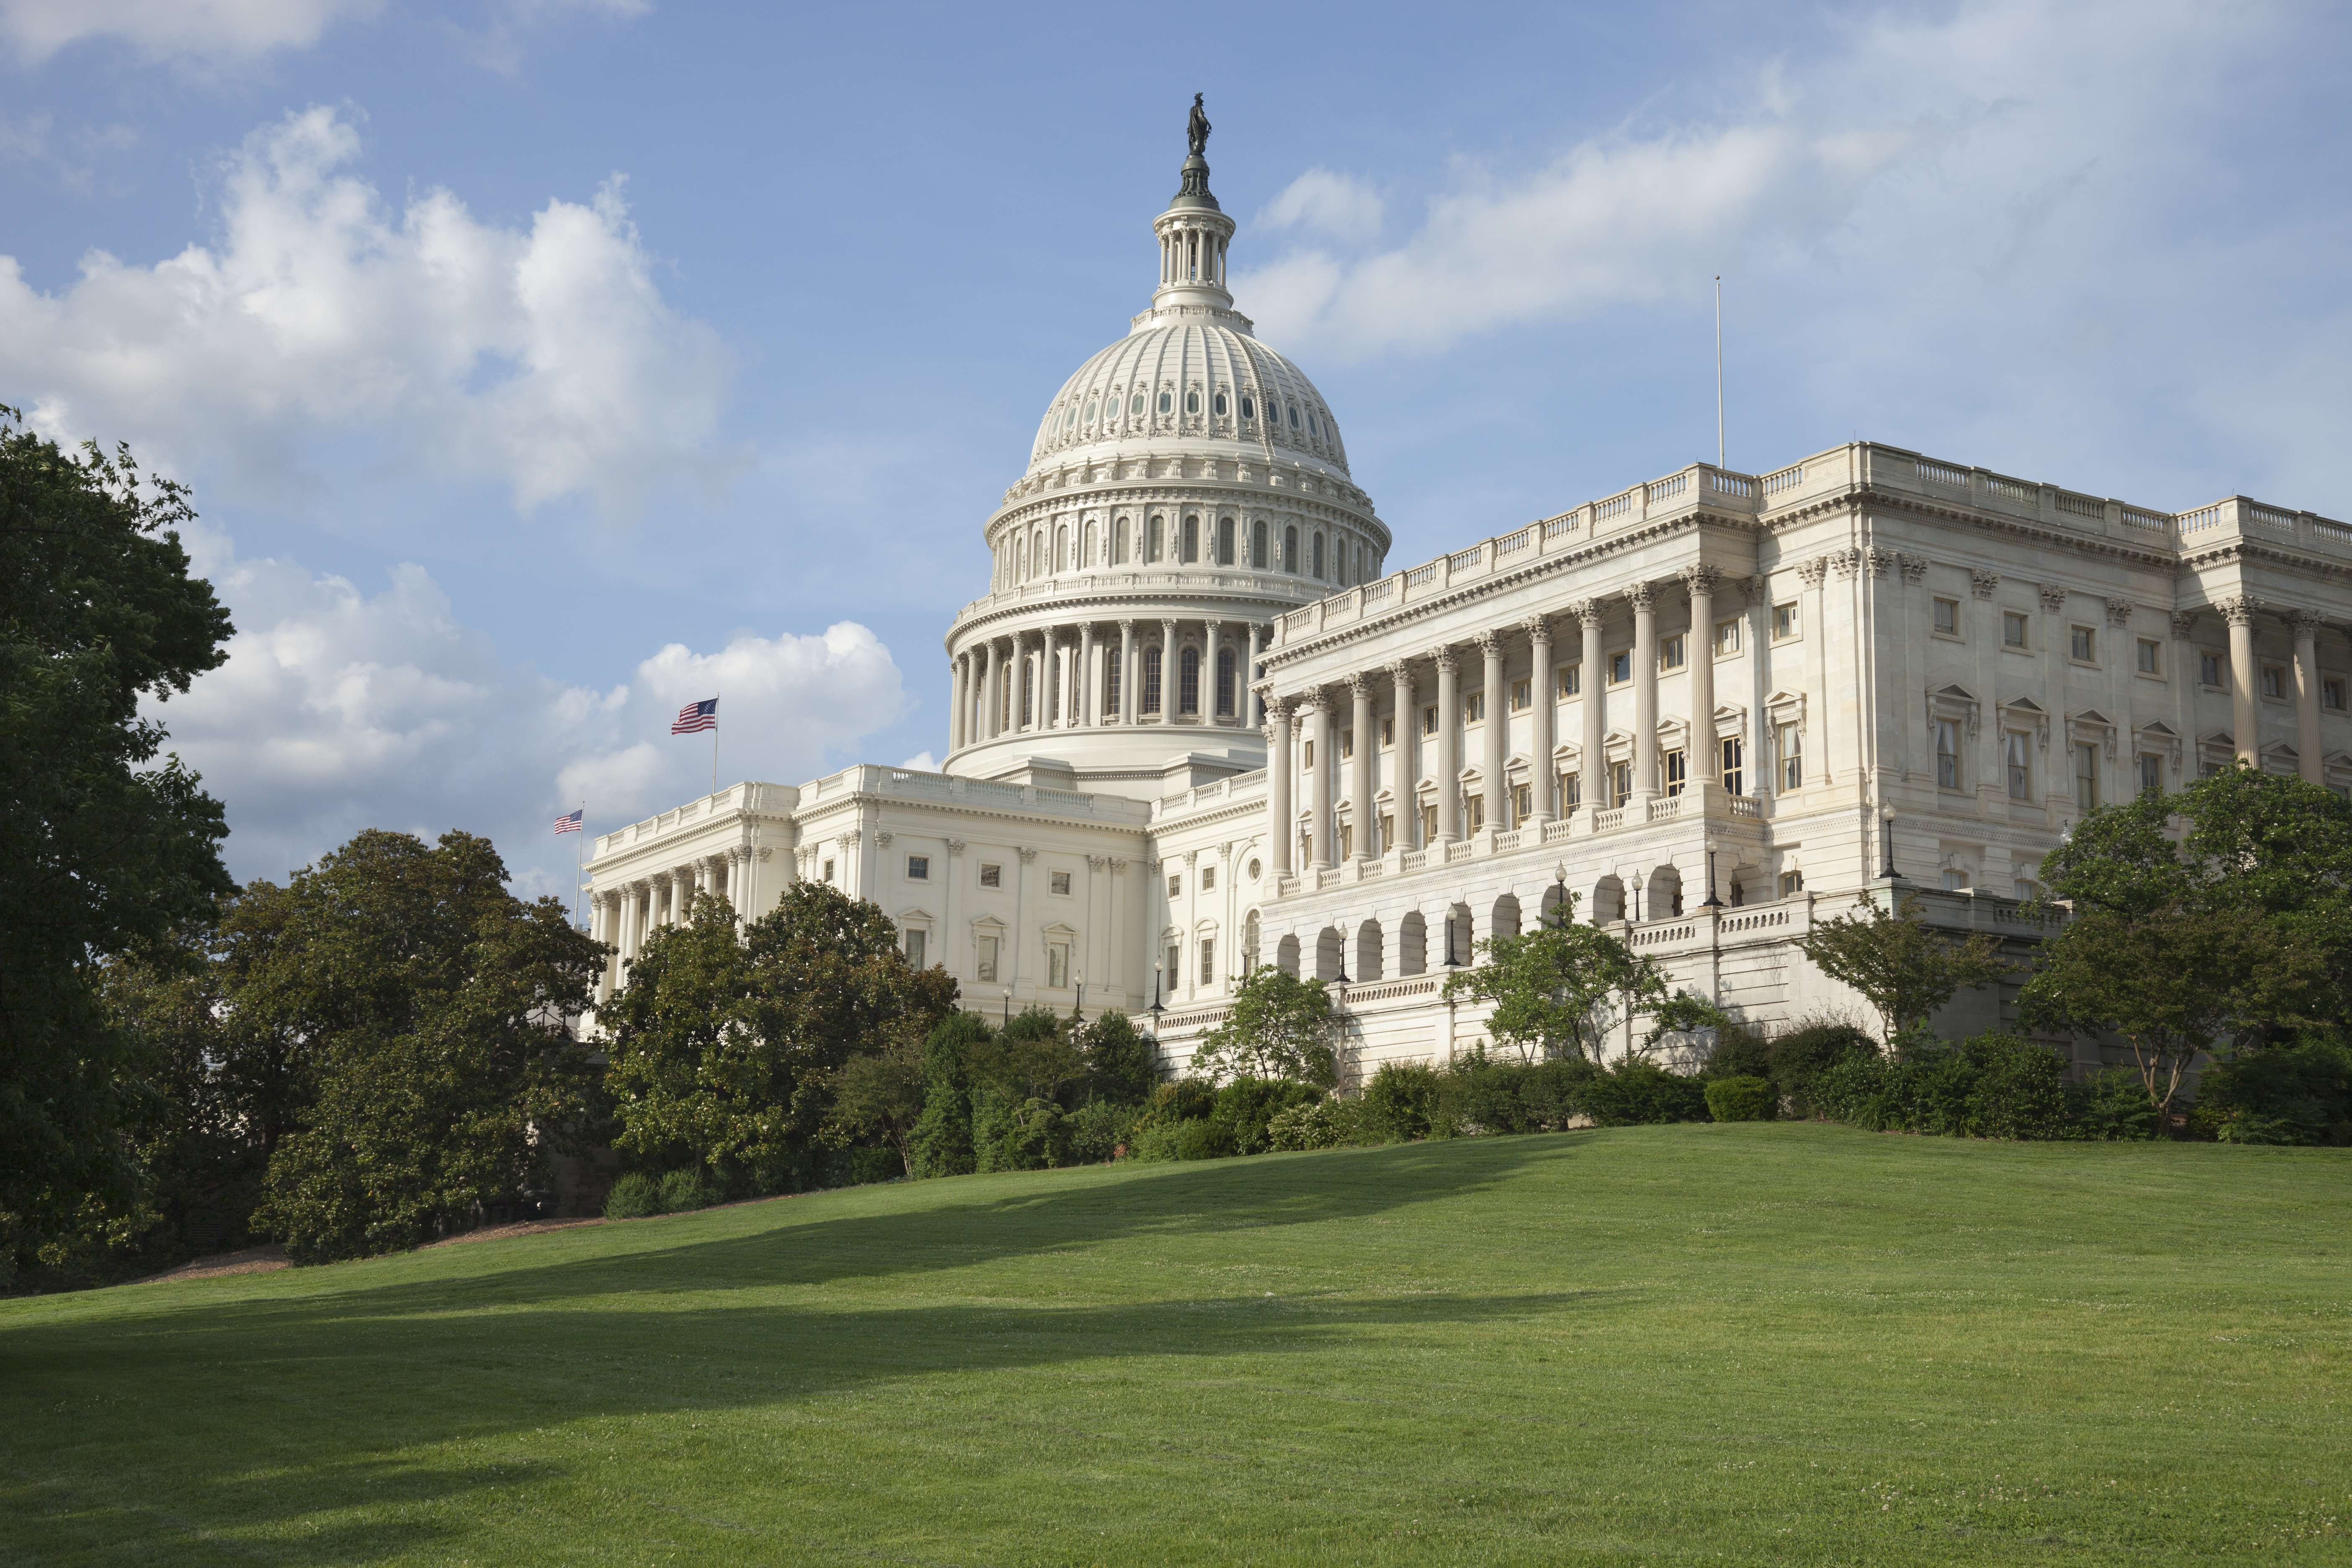 us-capitol-building-PQSLA5Y